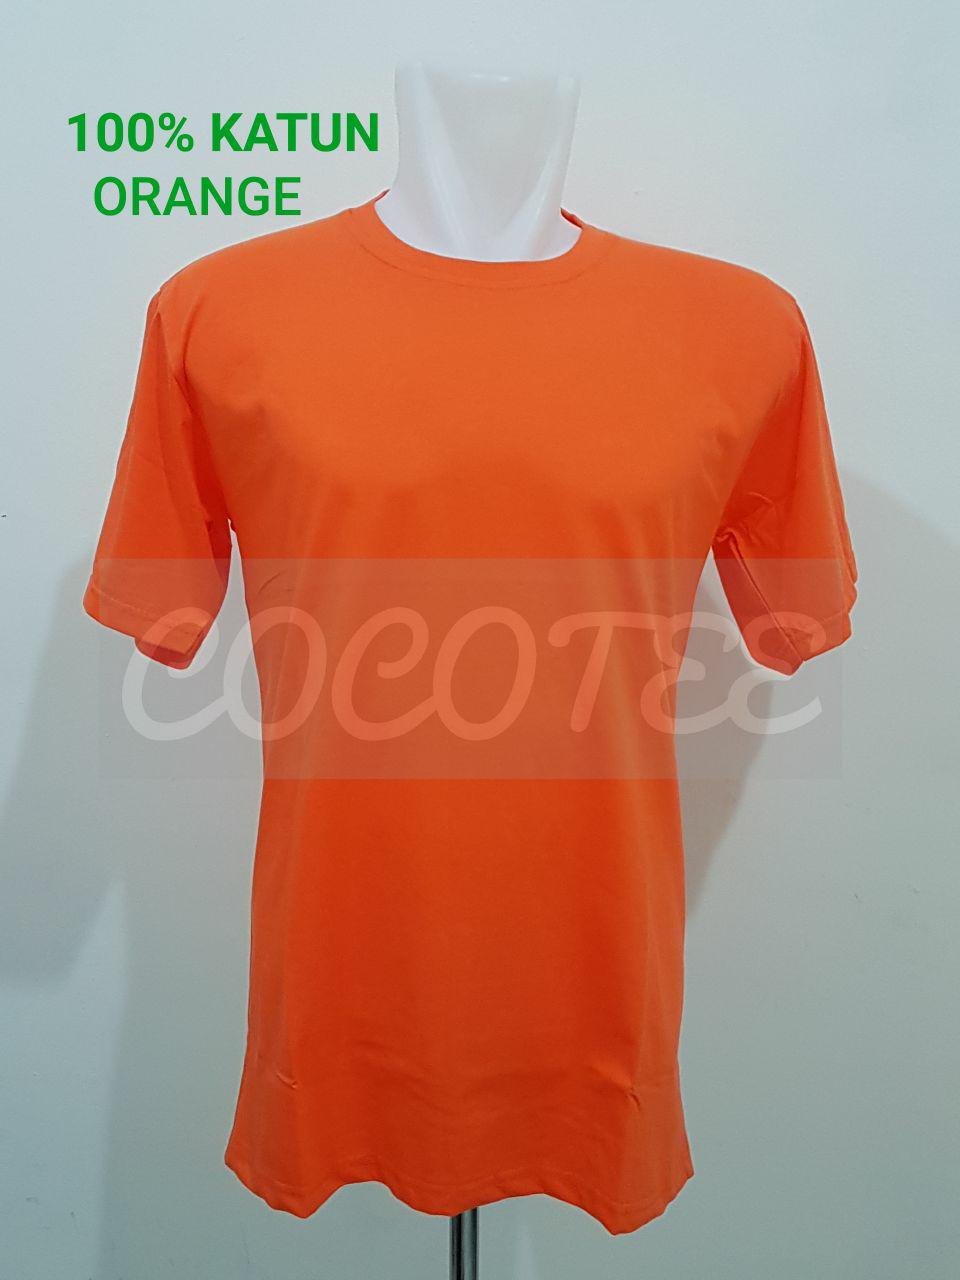 Jual Kaos Polos Anak Usia 7 10 Tahun 100 Katun Combed 30s Size 3 Baju Cowo Cewe Cocotee Tokopedia